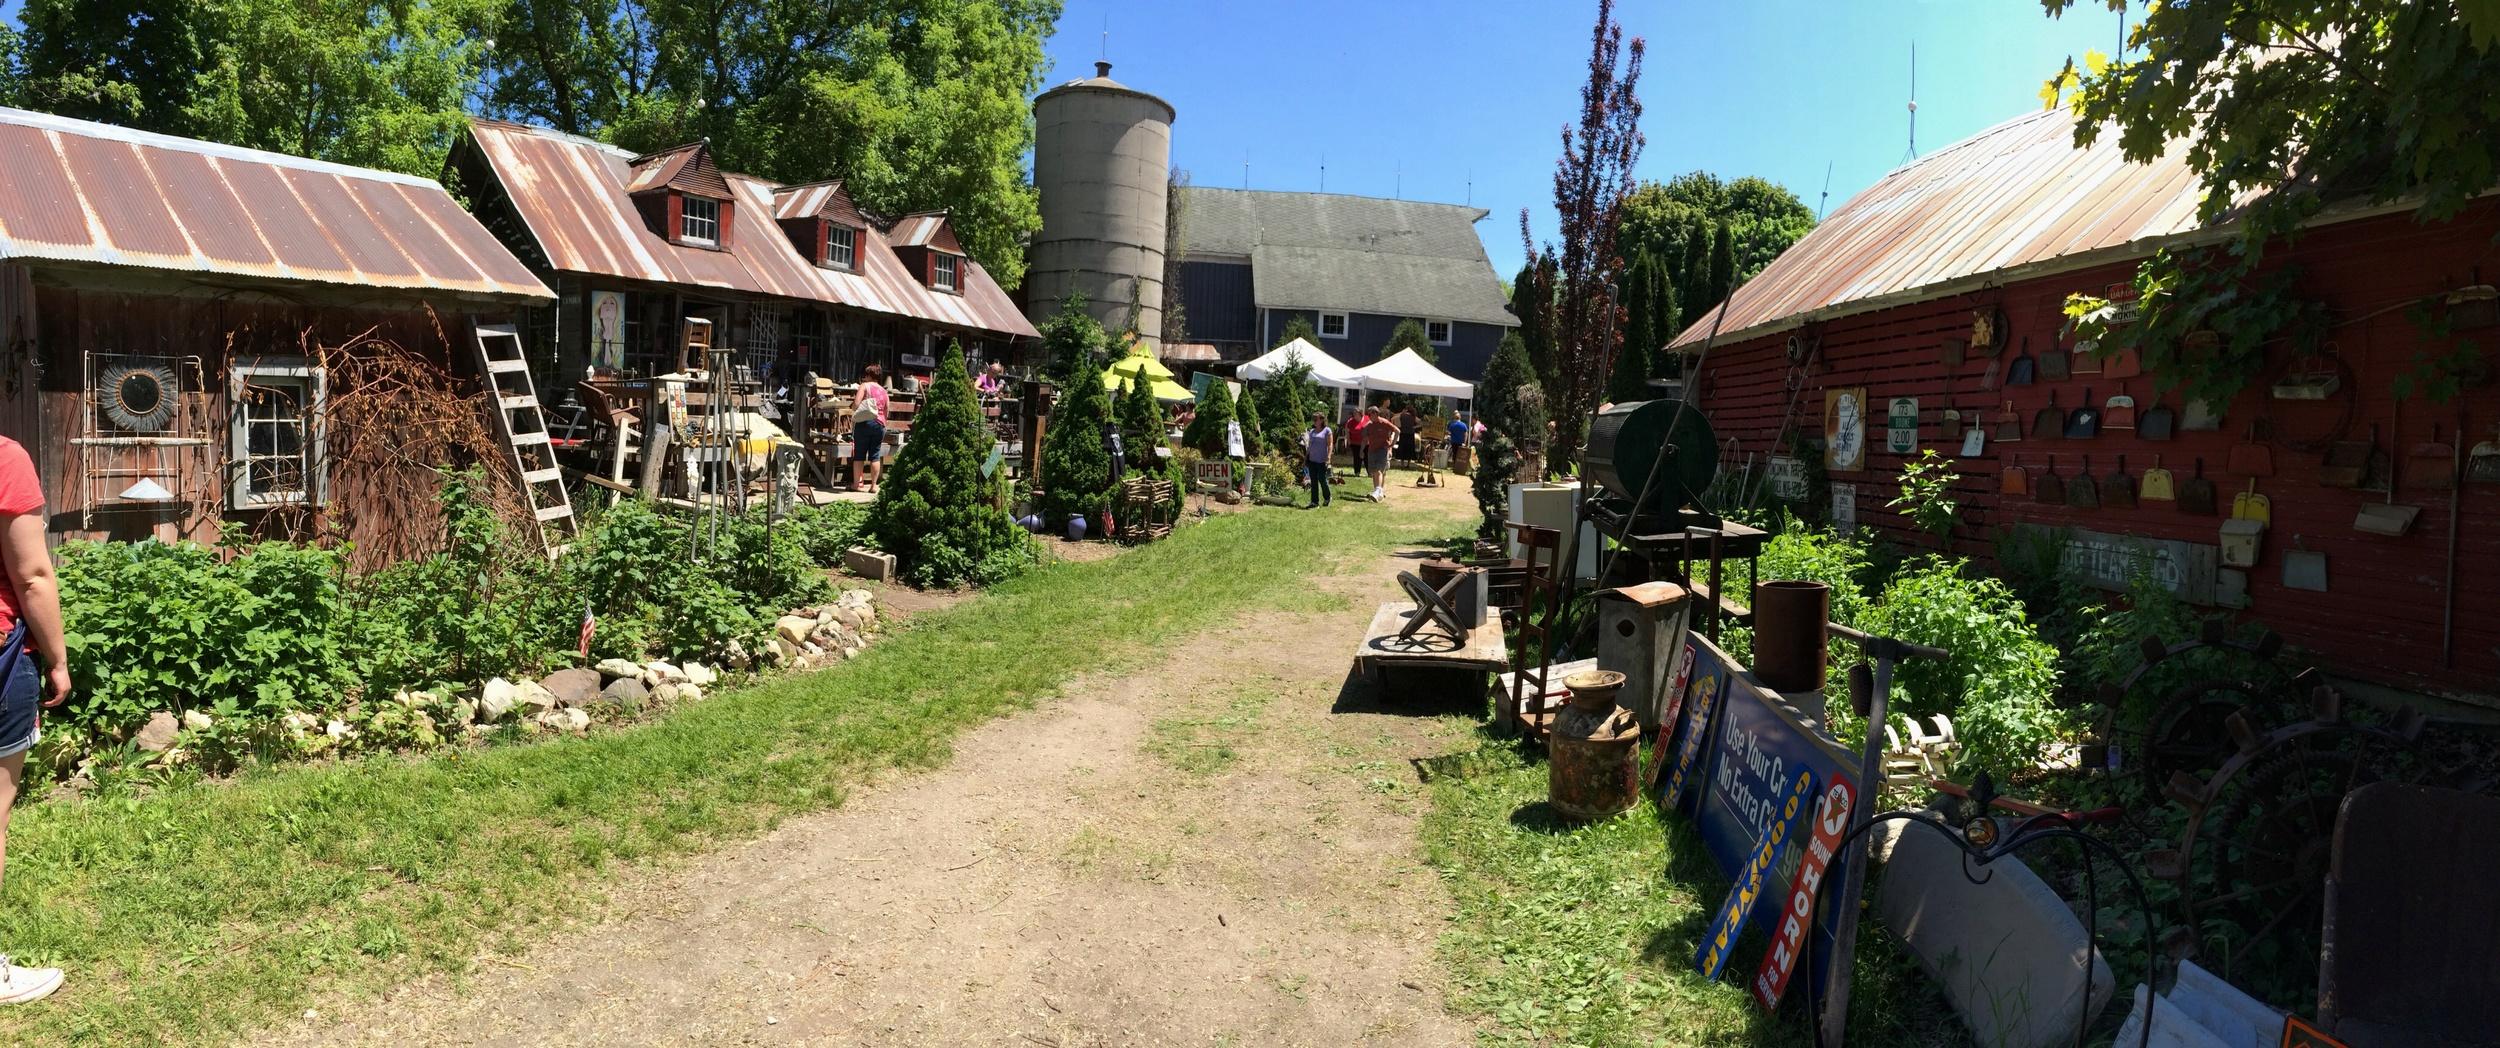 Serendipity Farms   Hippie Tom   Antique Pickin